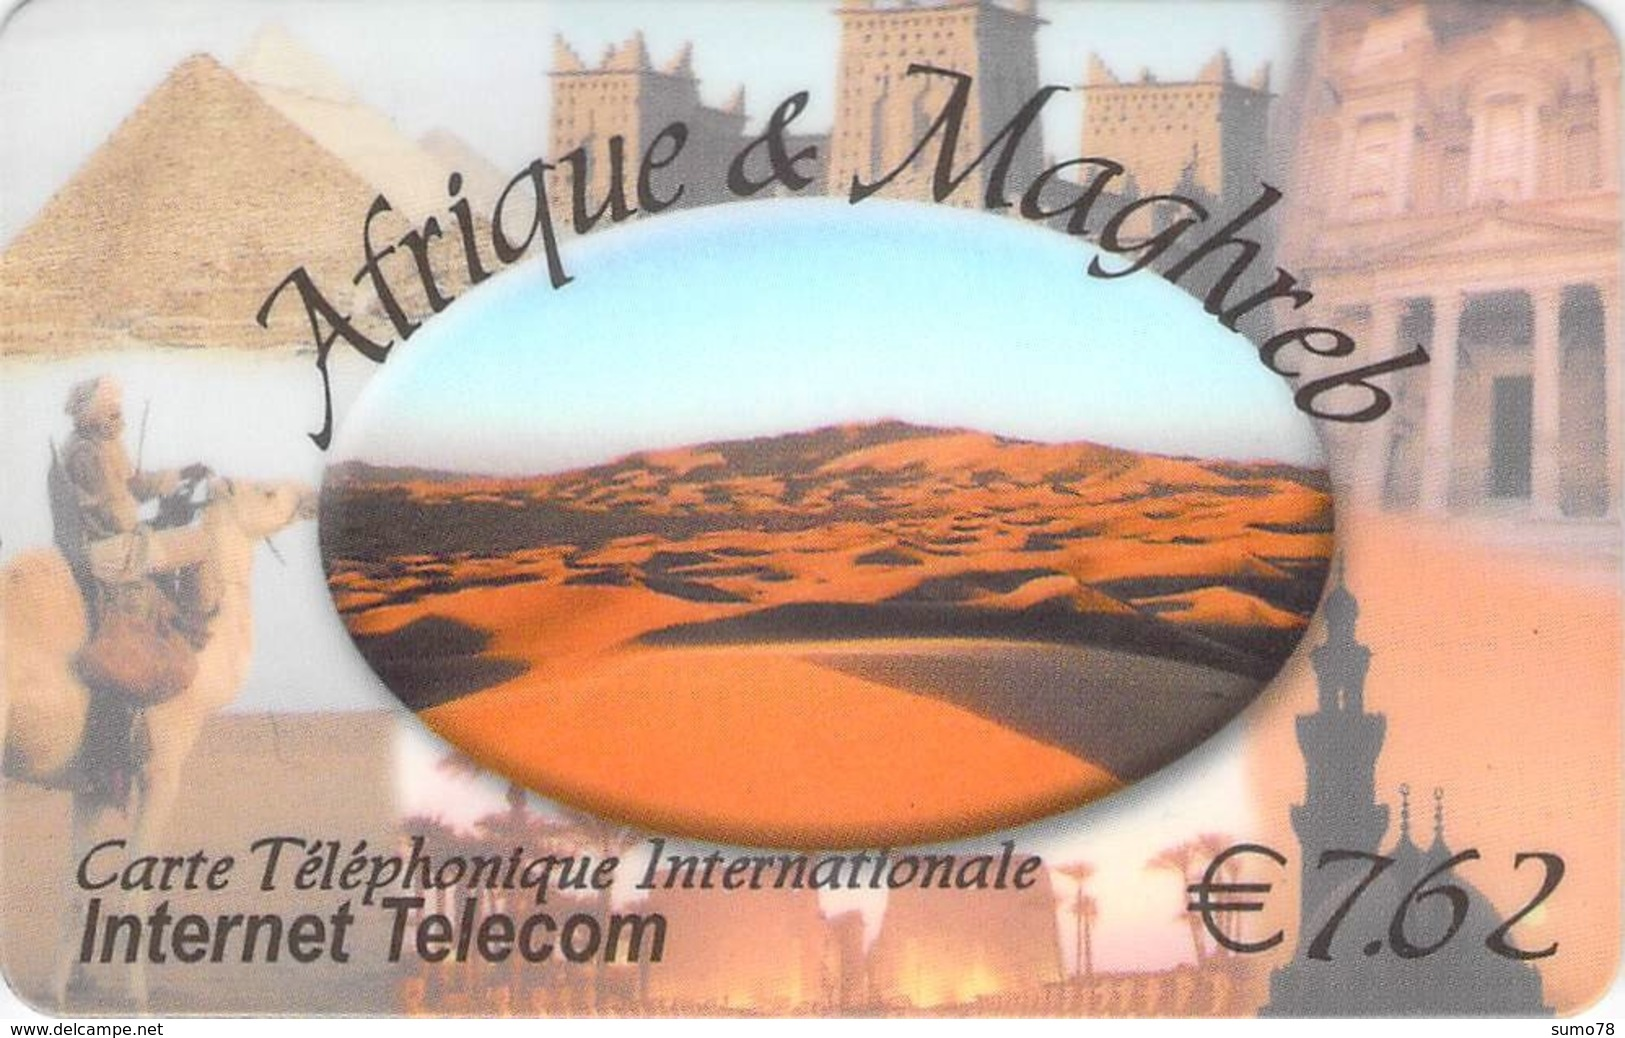 AFRIQUE ET MAGHREB  -  Prépaid - Carte Prépayée  - - Andere Voorafbetaalde Kaarten